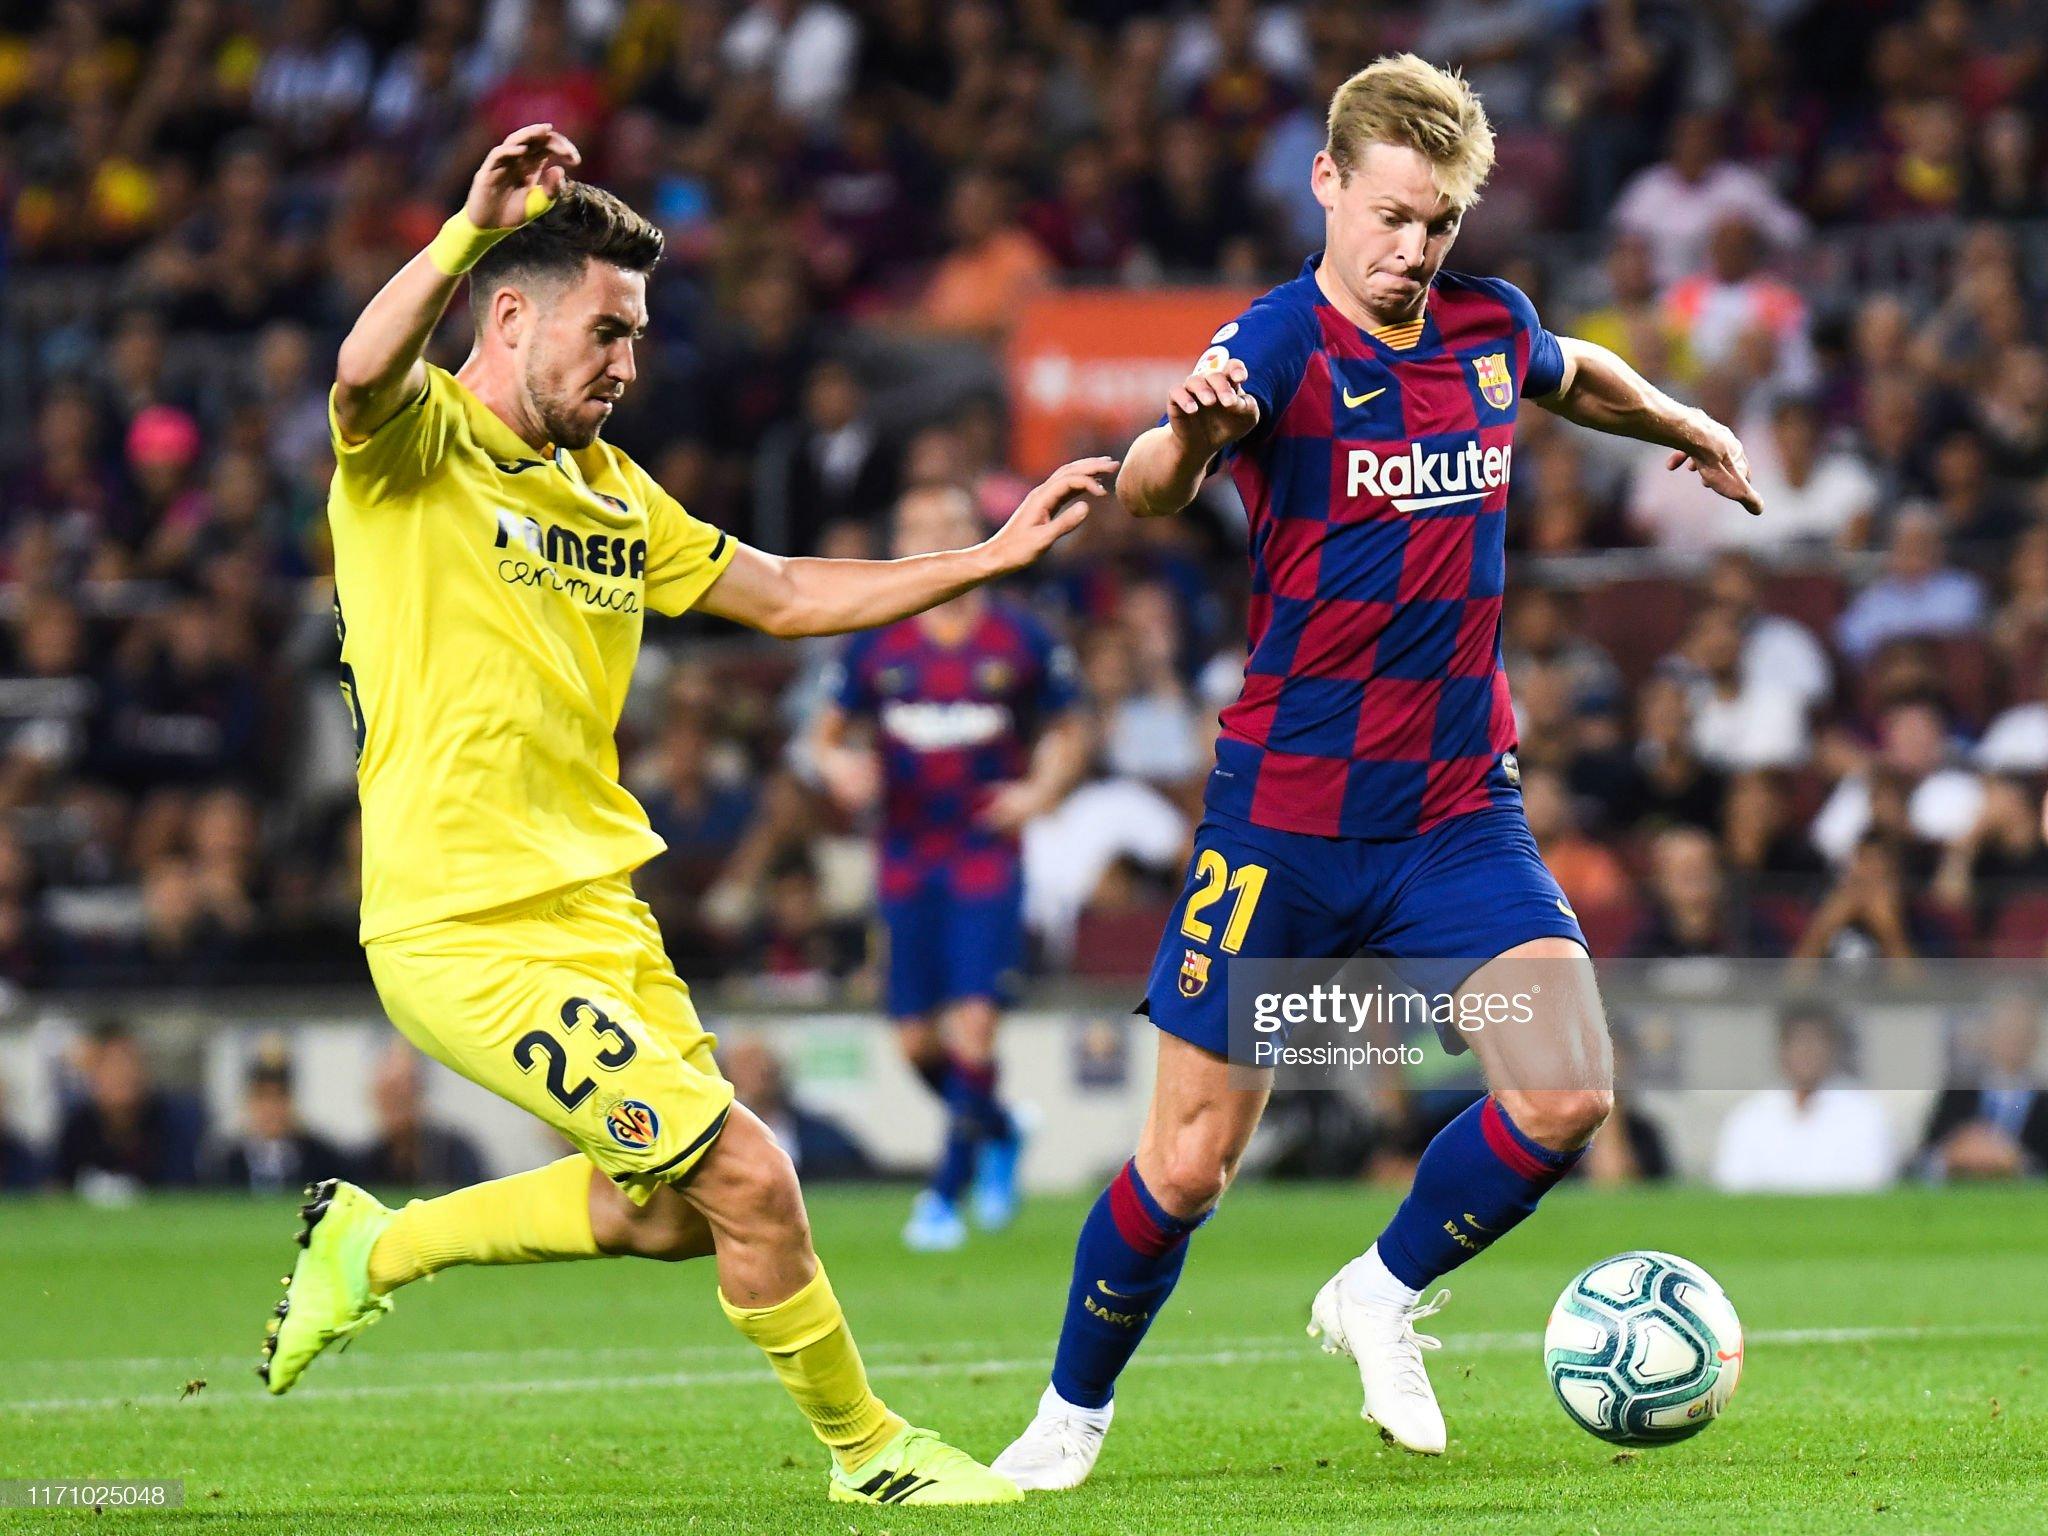 صور مباراة : برشلونة - فياريال 2-1 ( 24-09-2019 )  Frenkie-de-jong-of-fc-barcelona-and-moi-gomez-of-villarreal-cf-during-picture-id1171025048?s=2048x2048